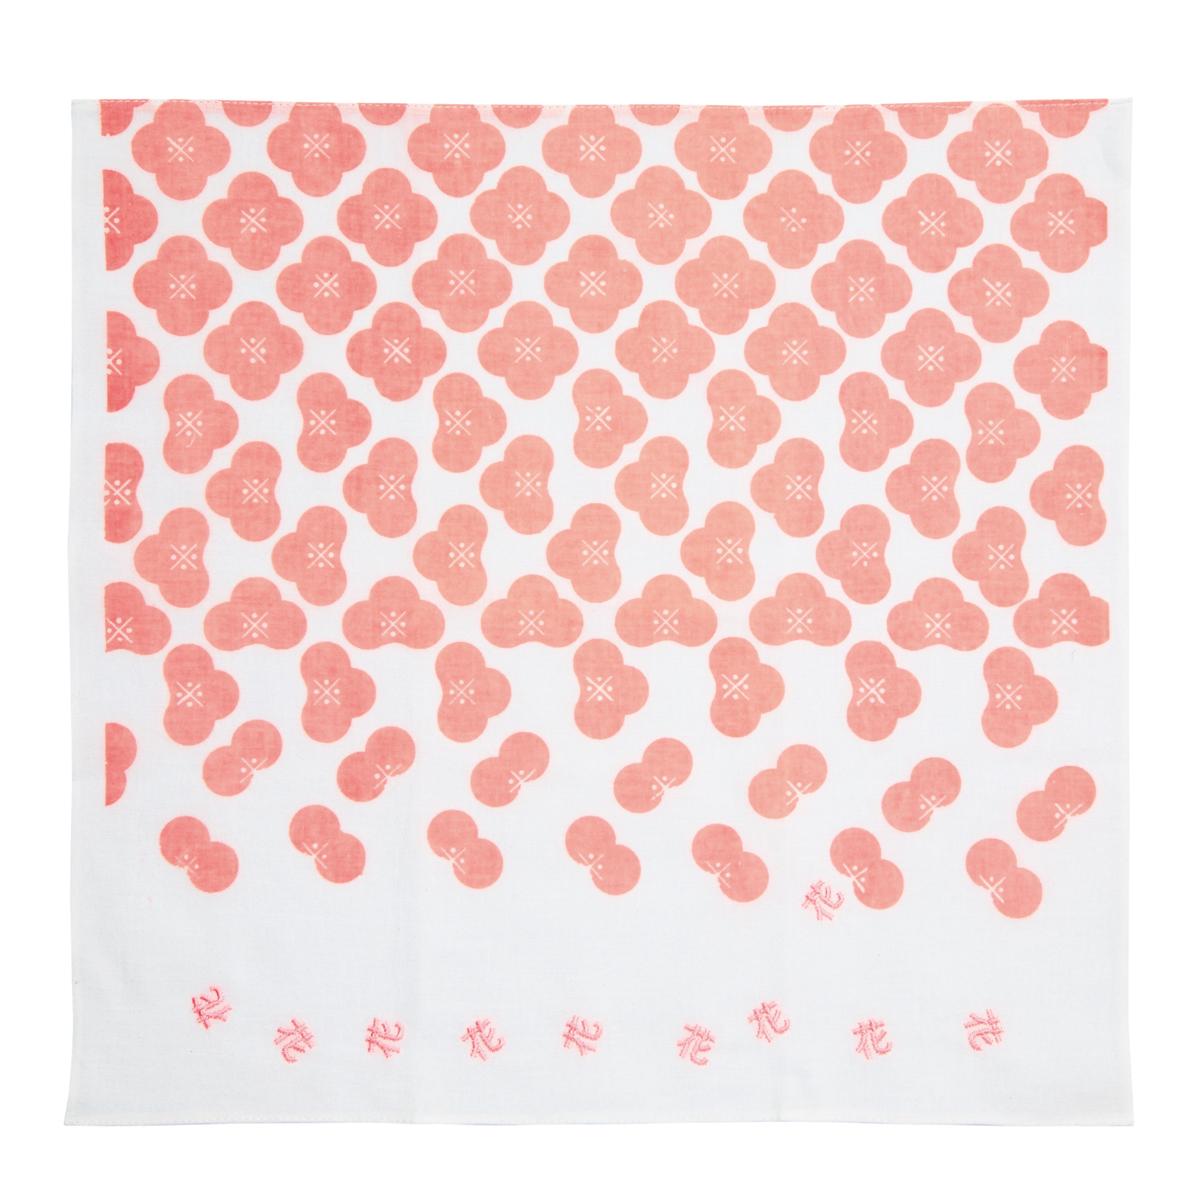 KY28-01P/ハンカチ/花〈ピンク〉/【6枚までゆうパケット可】